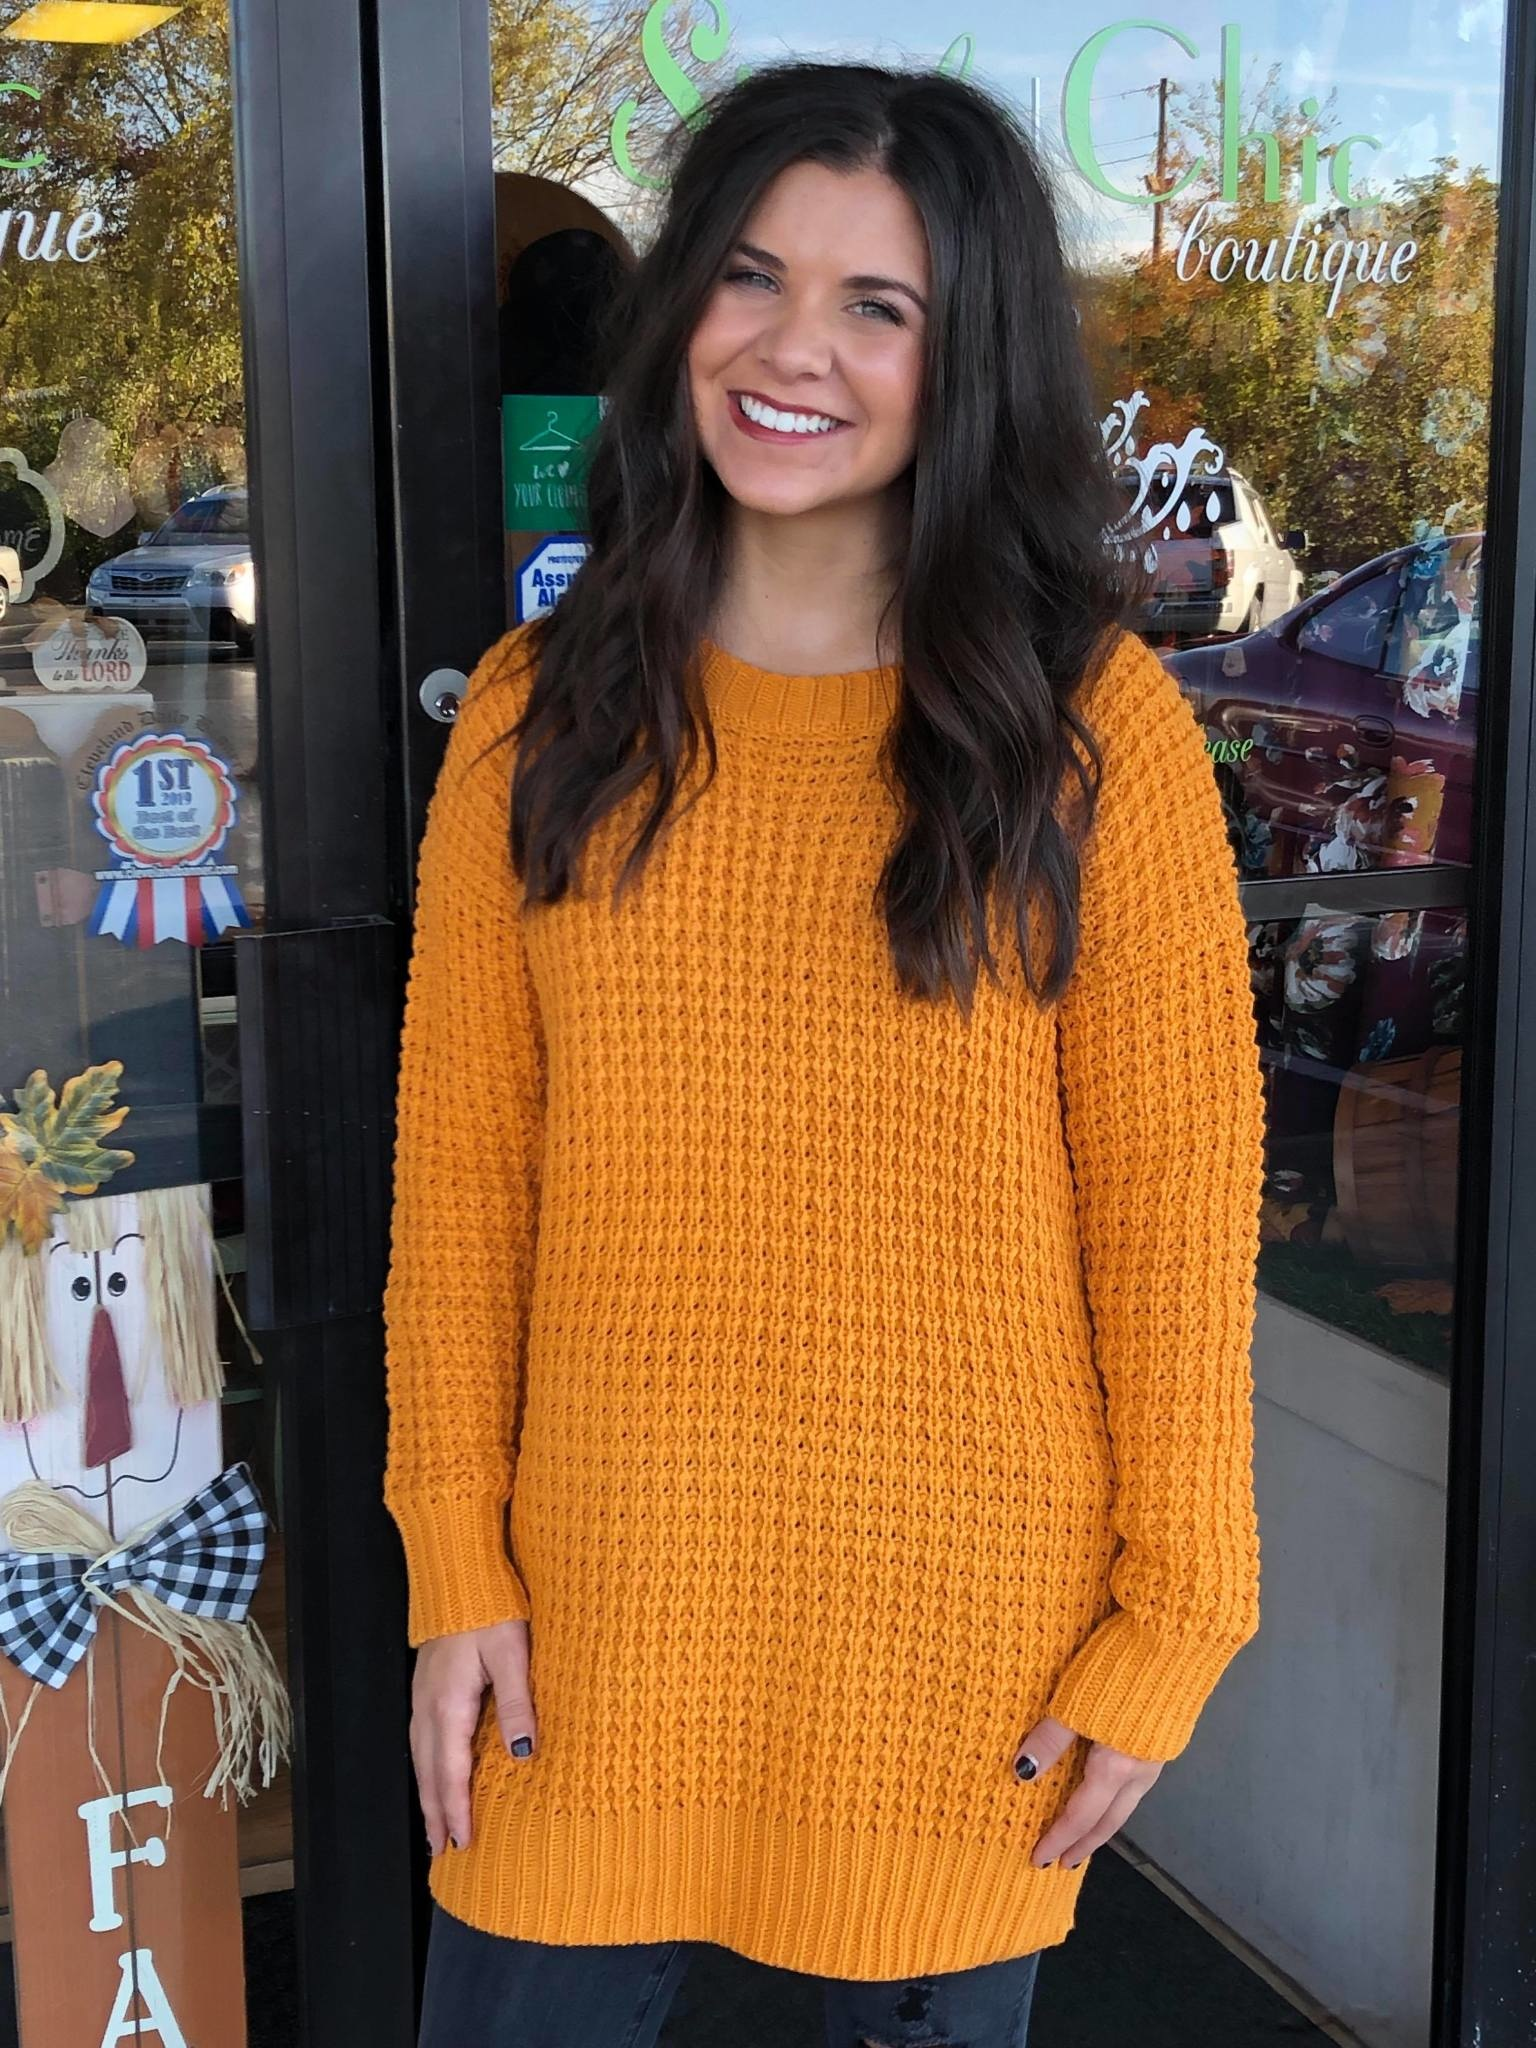 The Carmen Sweater